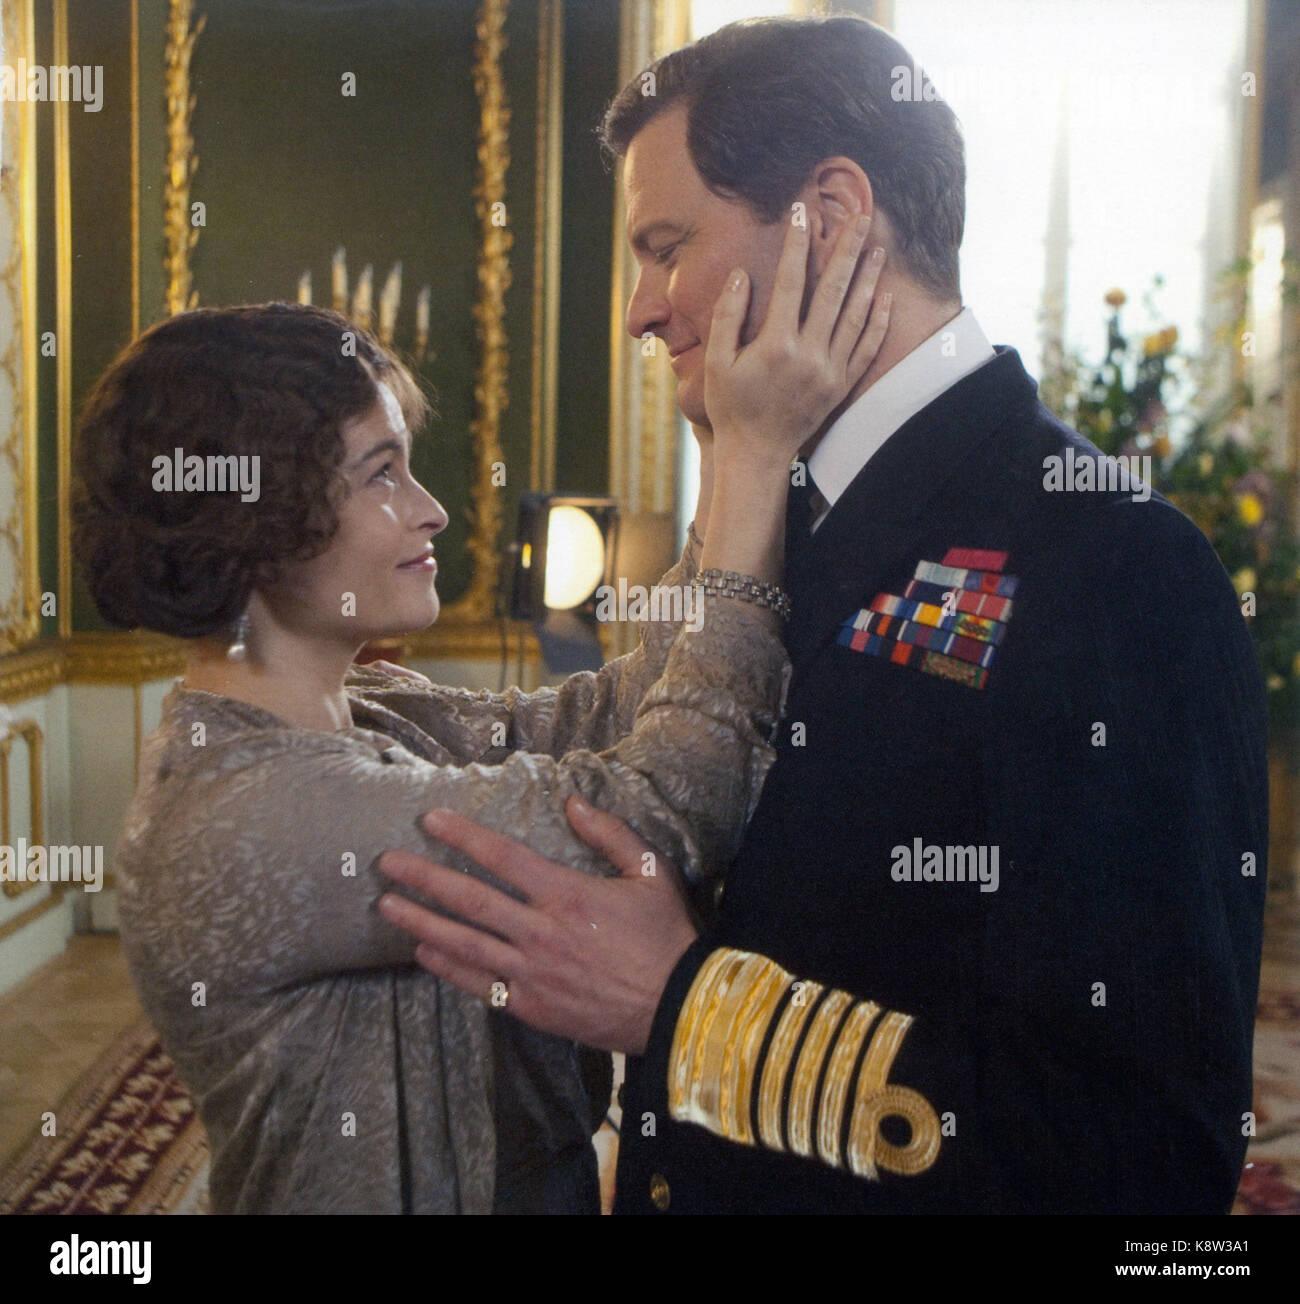 THE KING'S SPEECH 2010 Momentum Pictures Film mit Colin Firth und Helena Bonham-Carter Stockbild